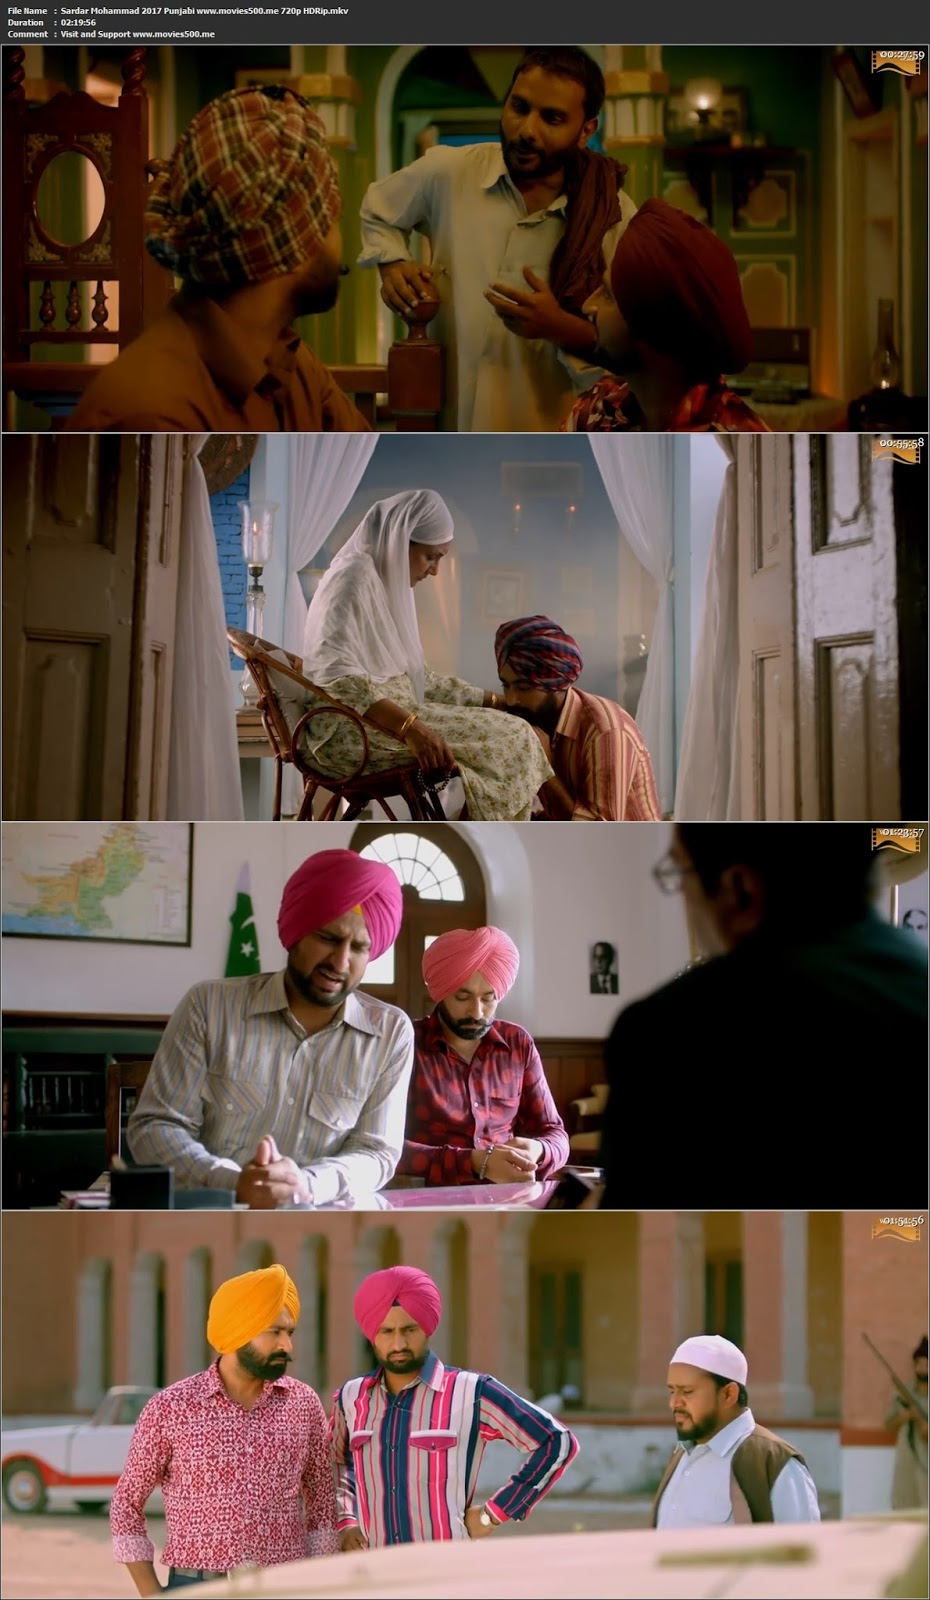 Sardar Mohammad 2017 Punjabi Full Movie HDRip 720p at movies500.info